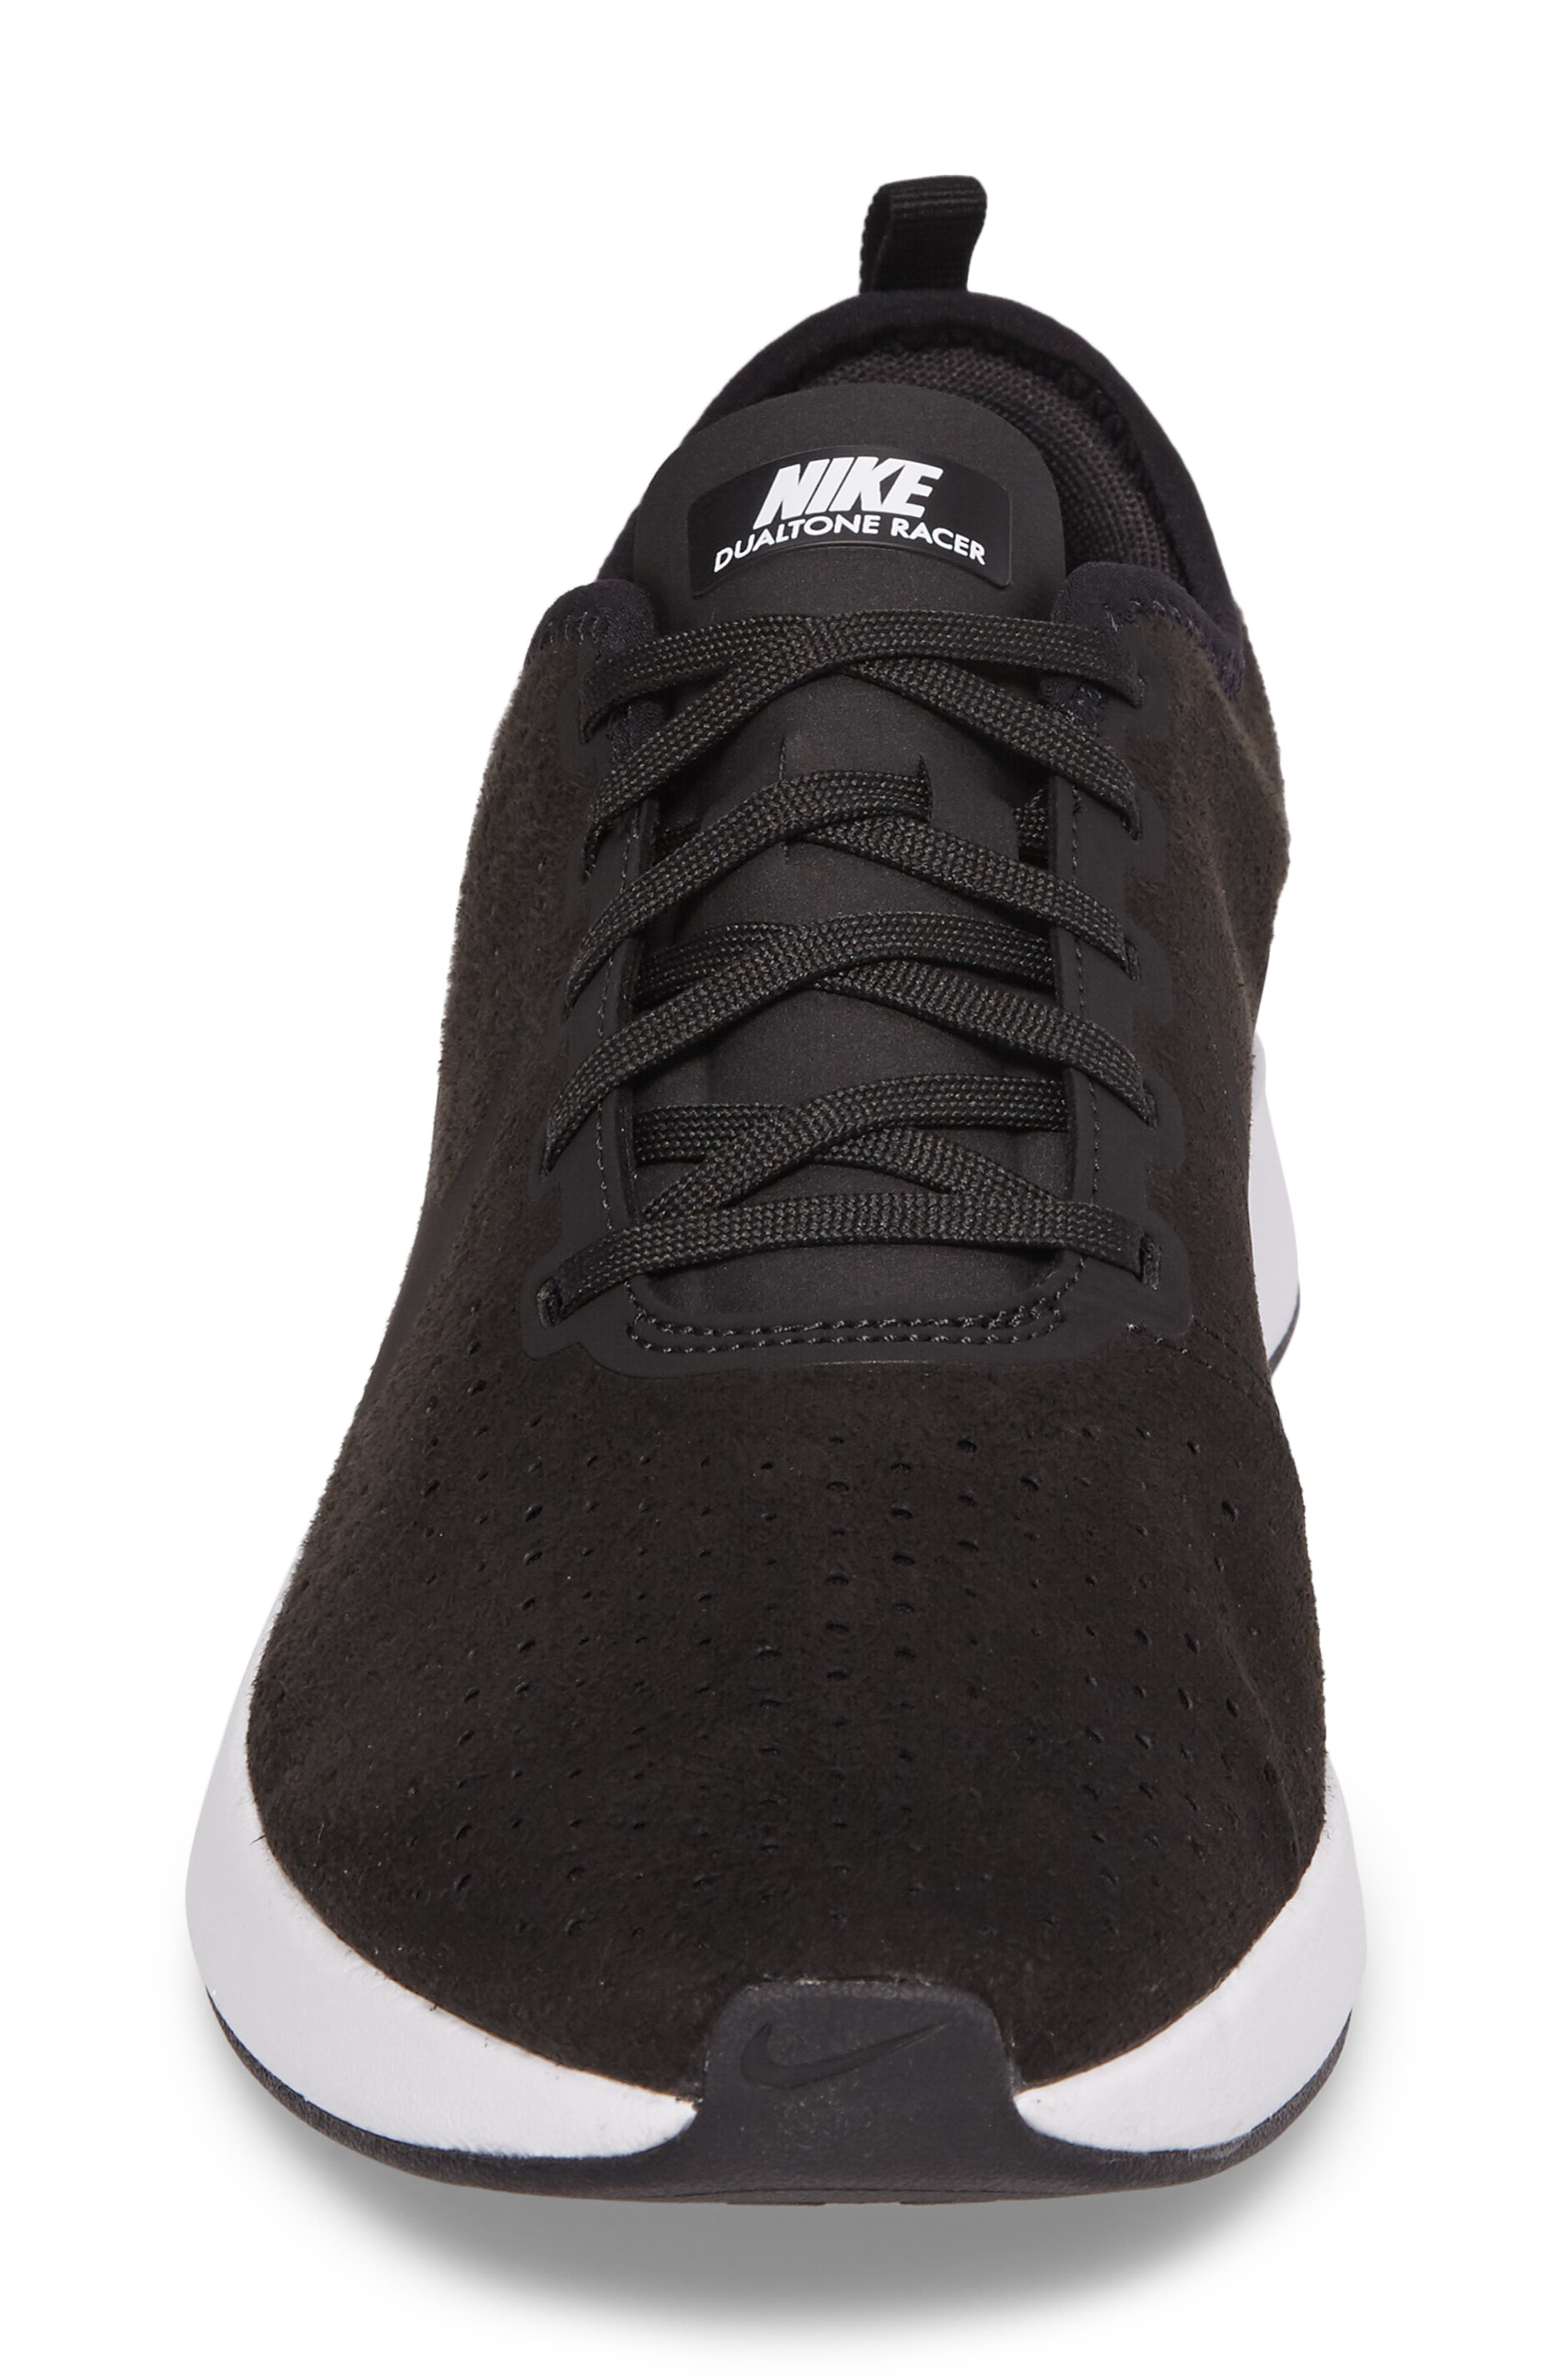 Dualtone Racer Premium Sneaker,                             Alternate thumbnail 4, color,                             Black/Black/White